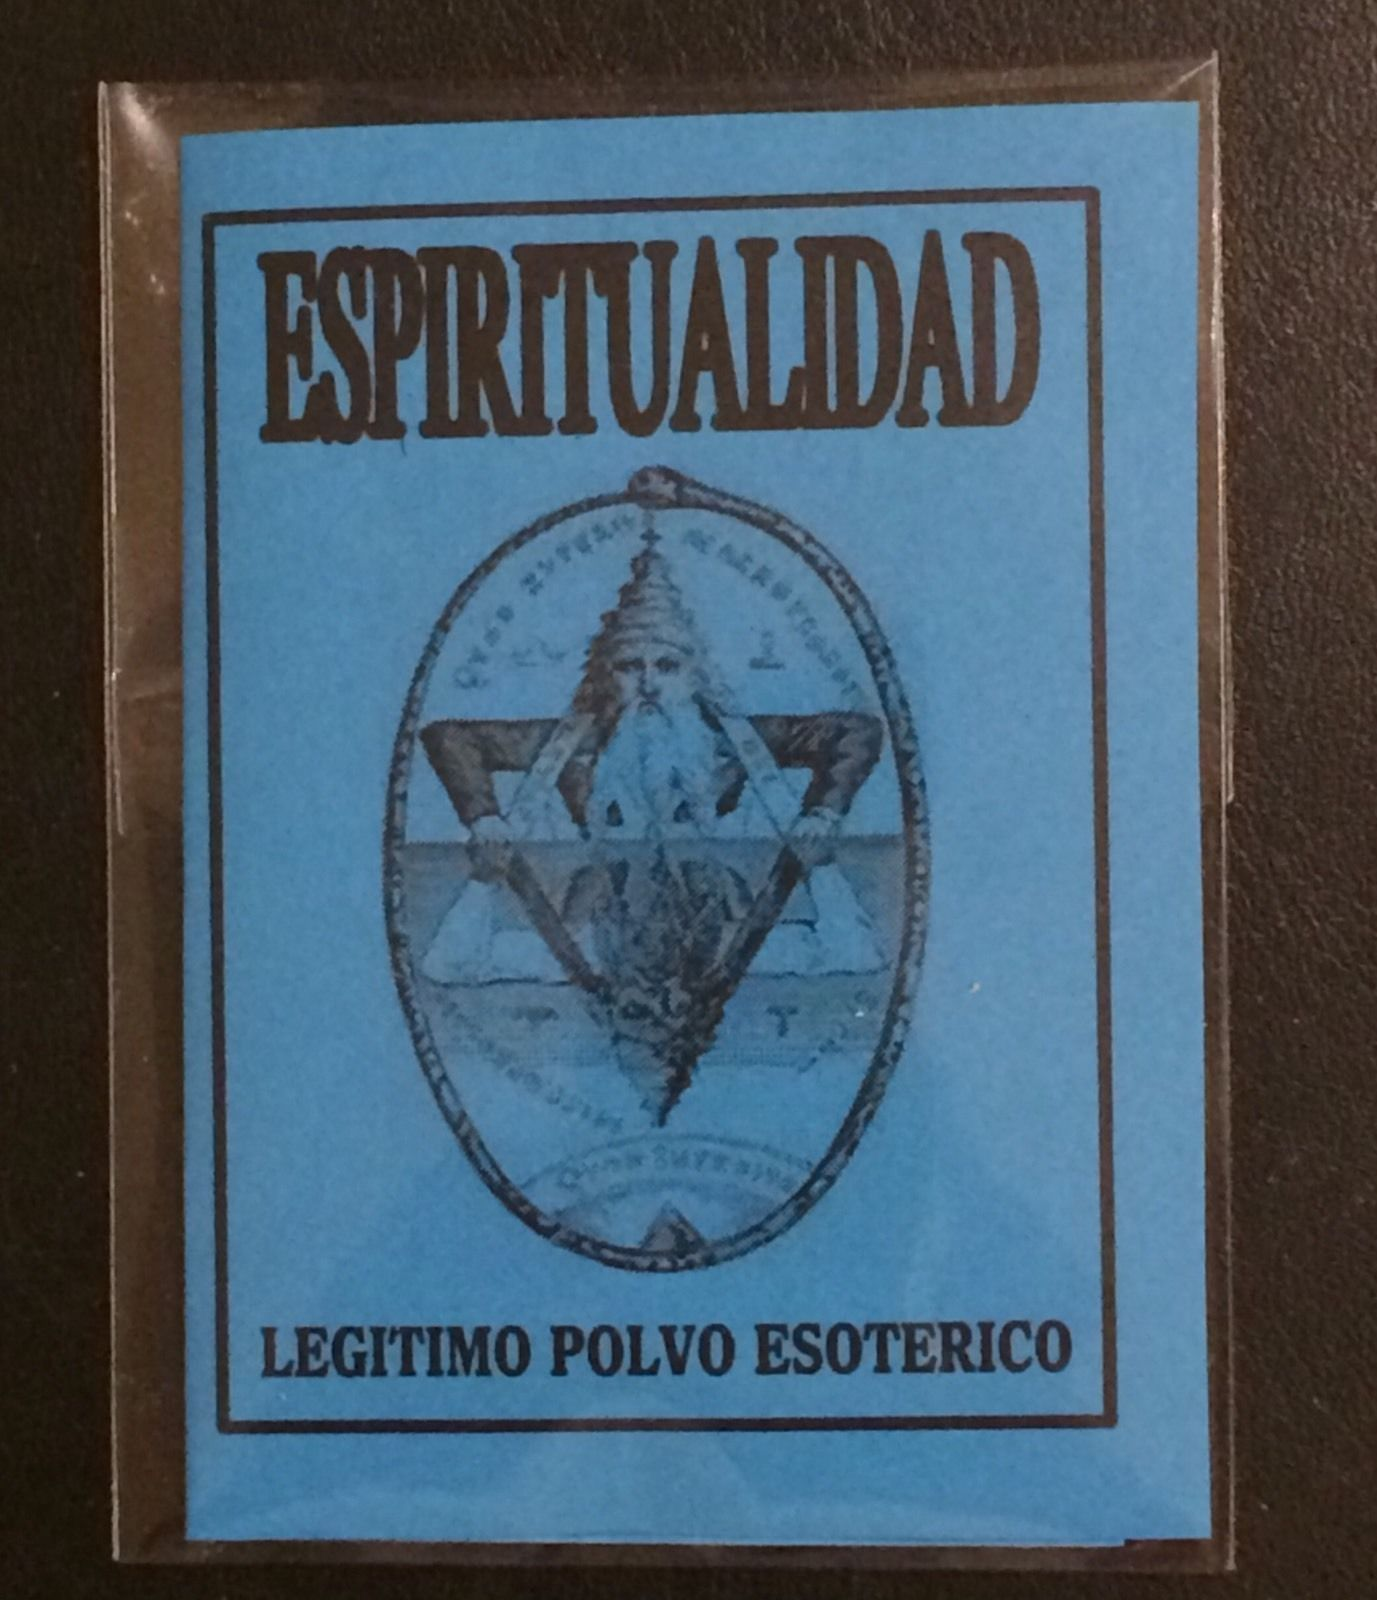 LEGITIMO POLVO ESOTERICO ESPIRITUALIDAD